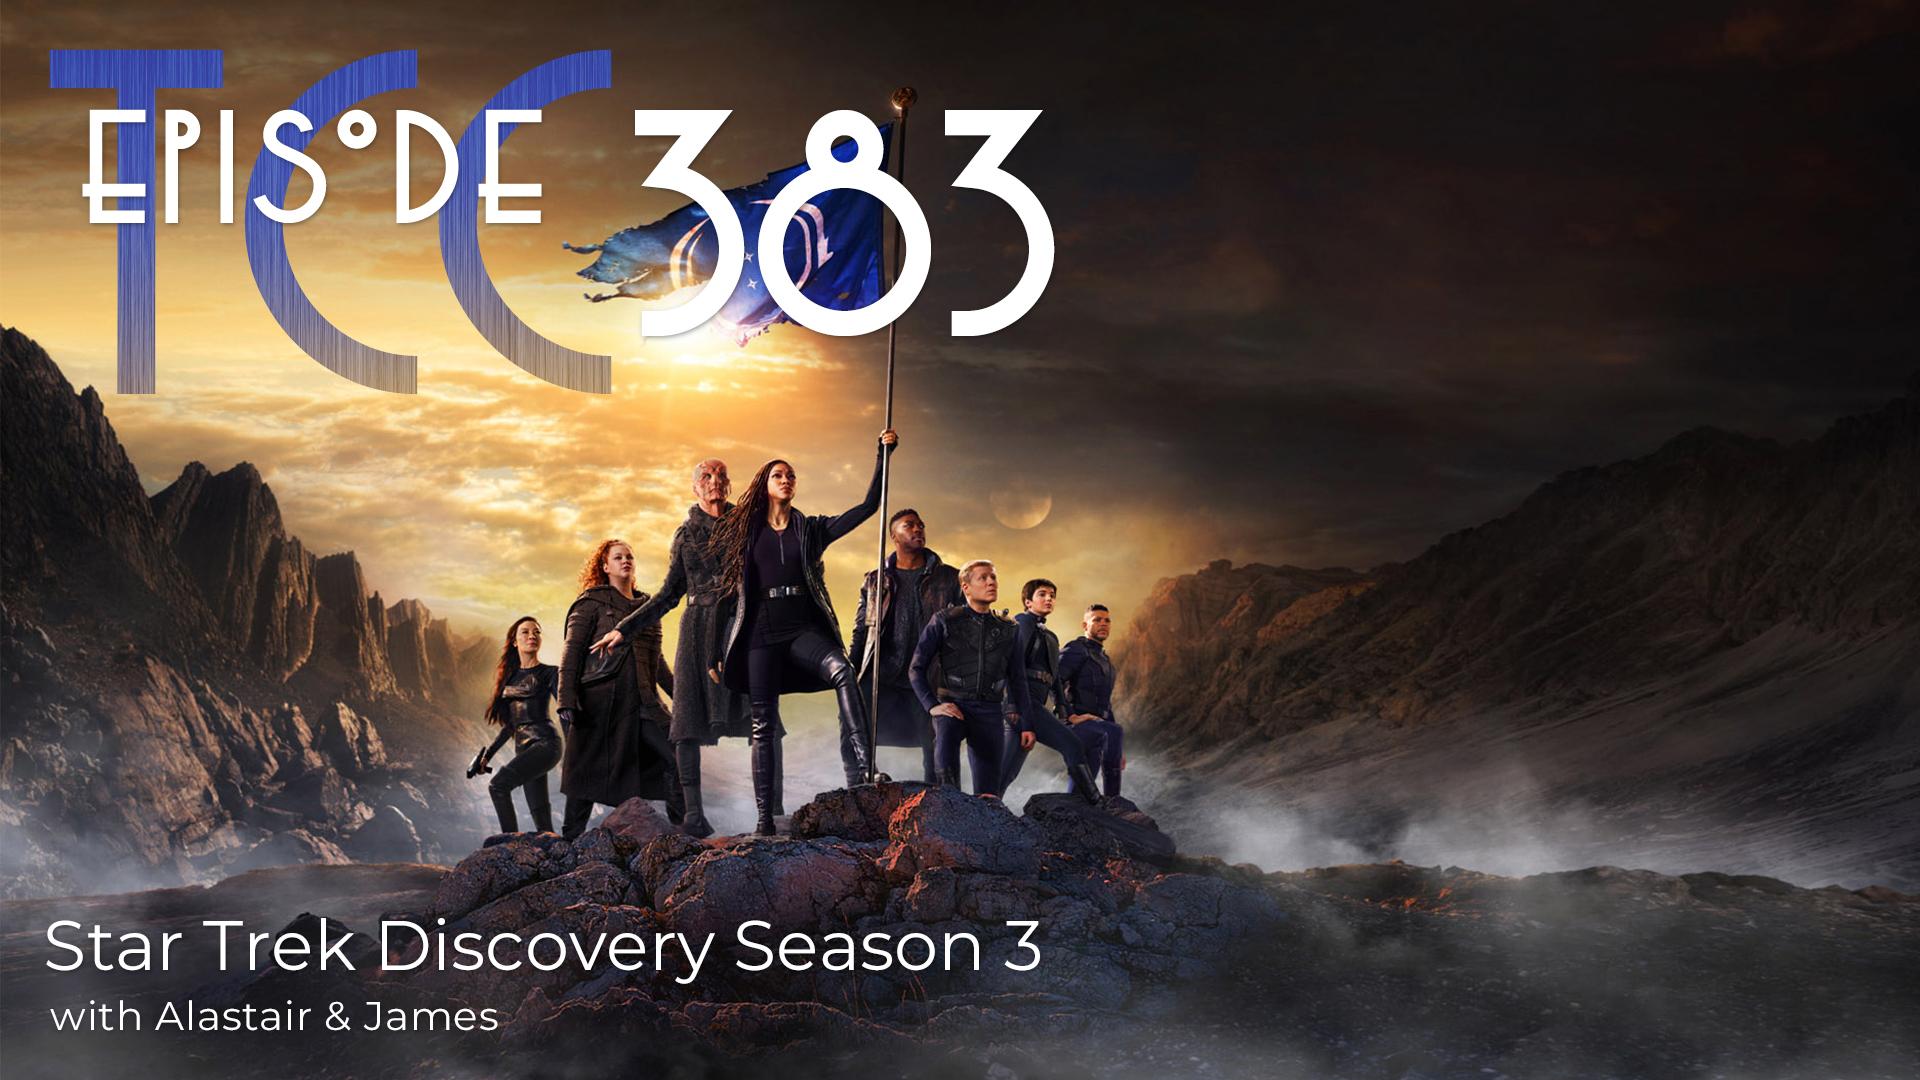 The Citadel Cafe 383: Star Trek Discovery Season 3